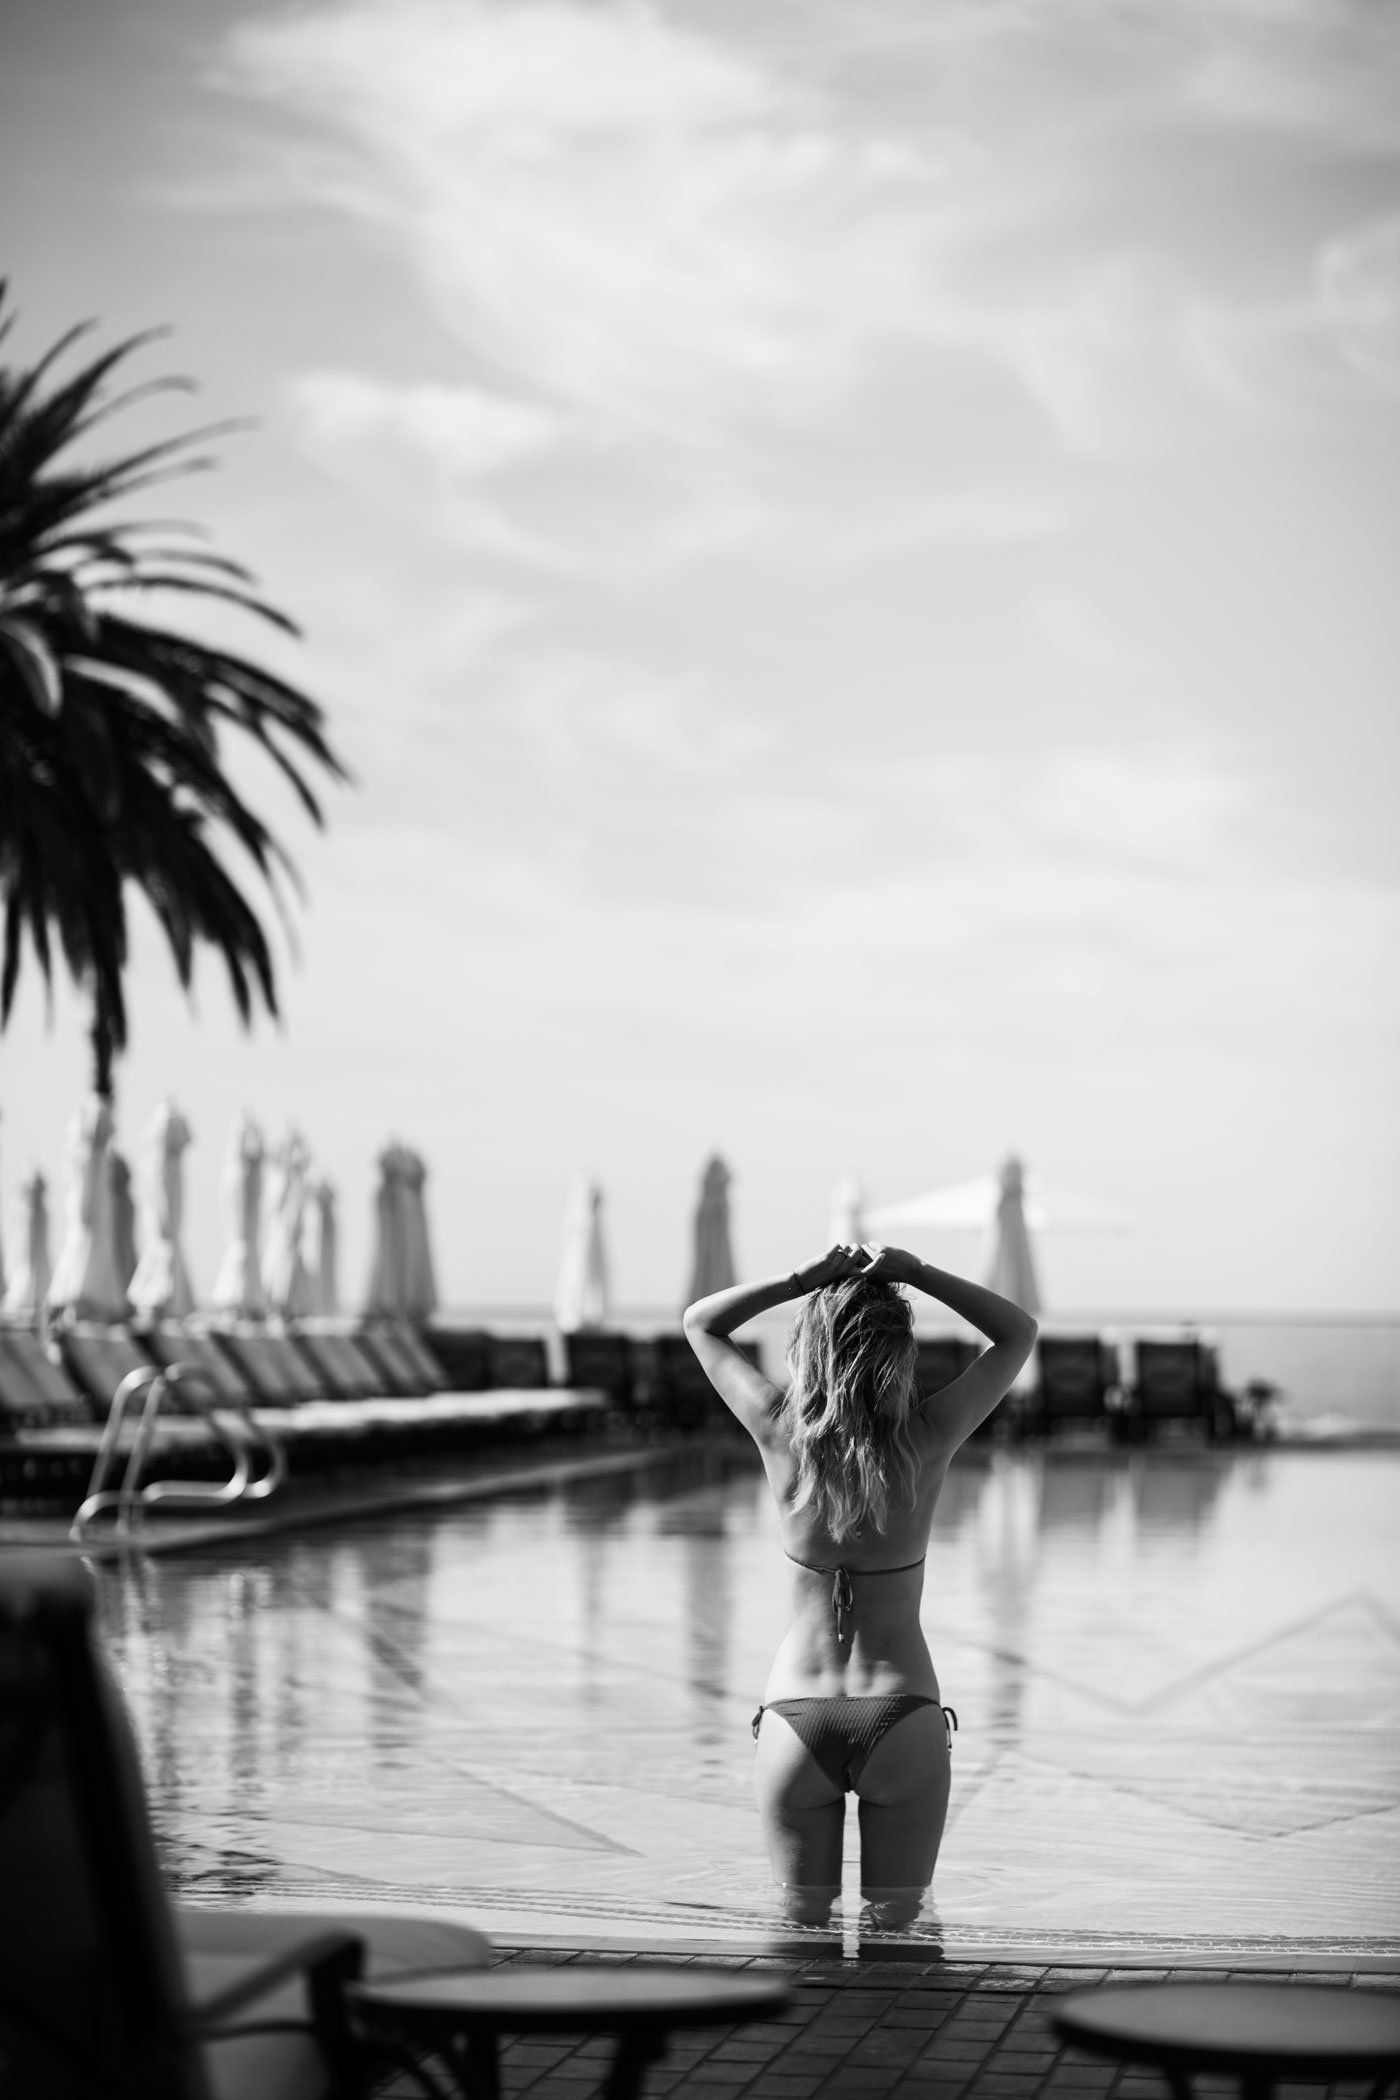 montage-laguna-beach-rebecca-laurey-2